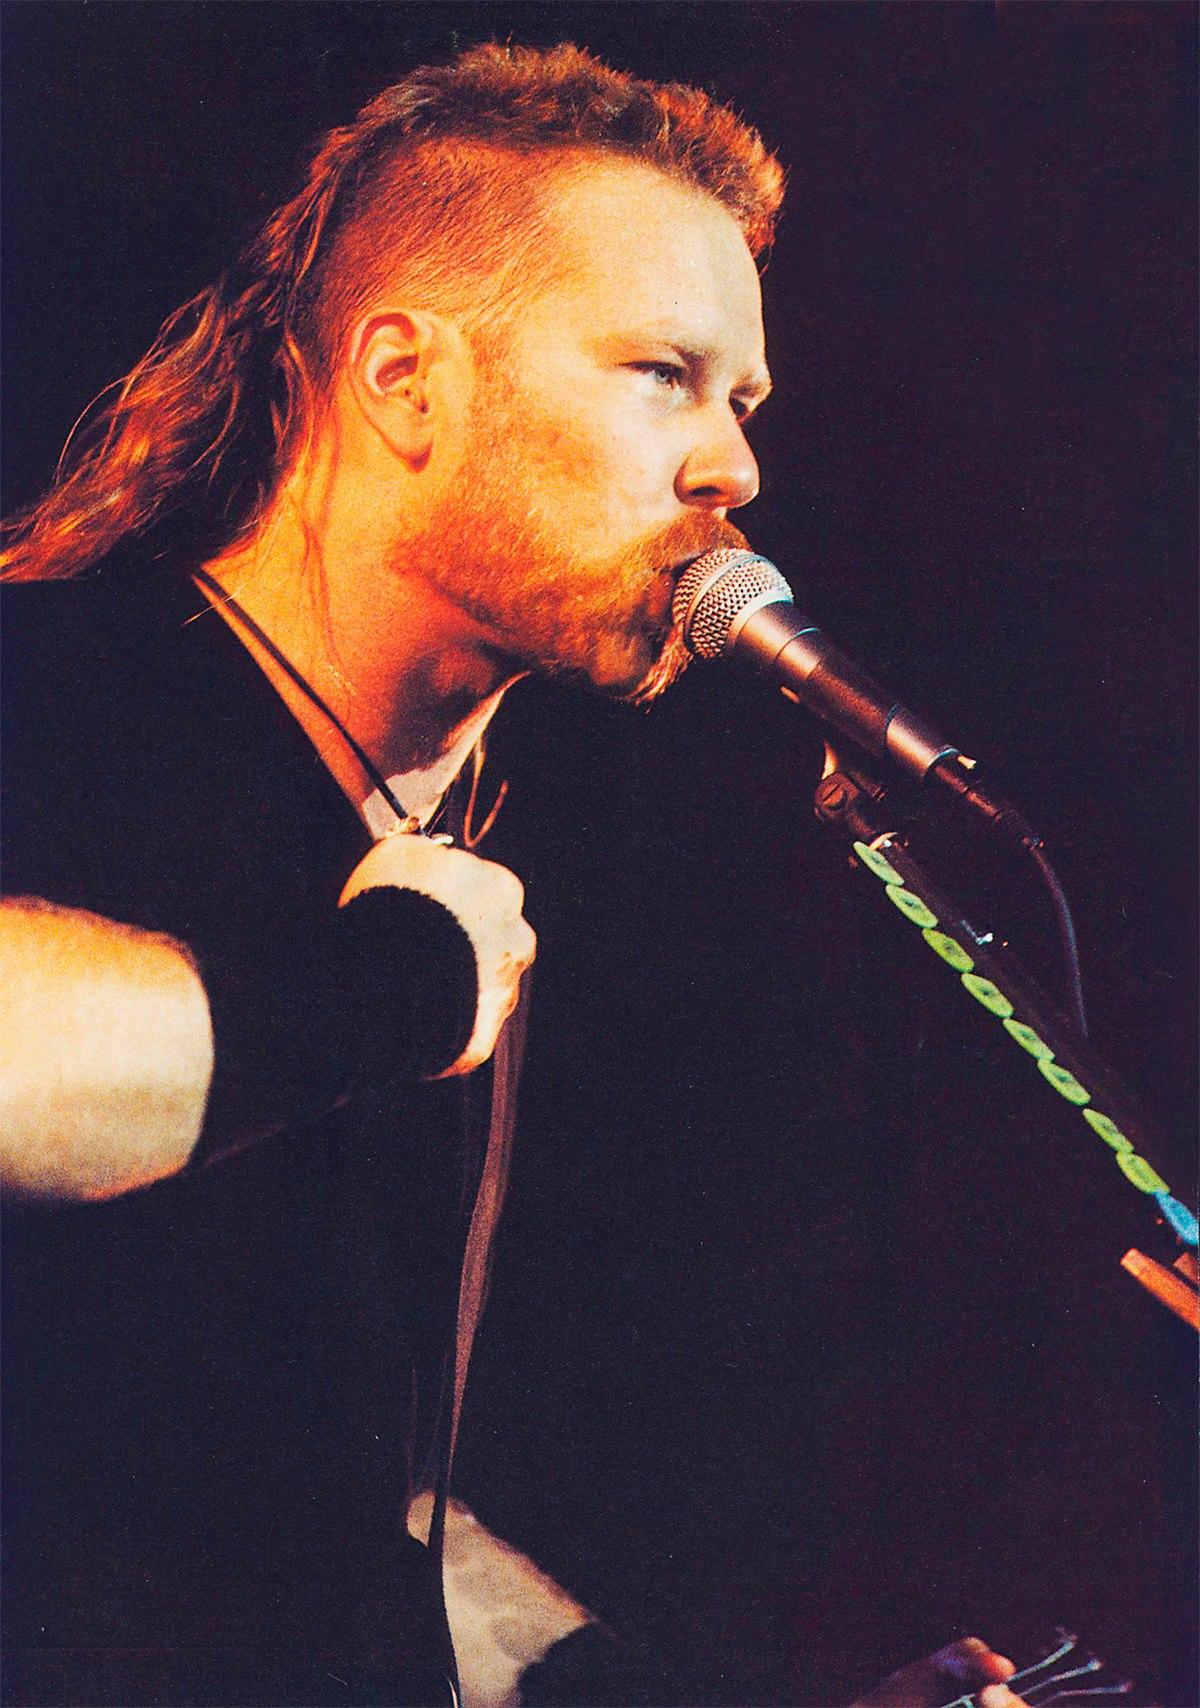 james hetfield 1995 - Кинозавр